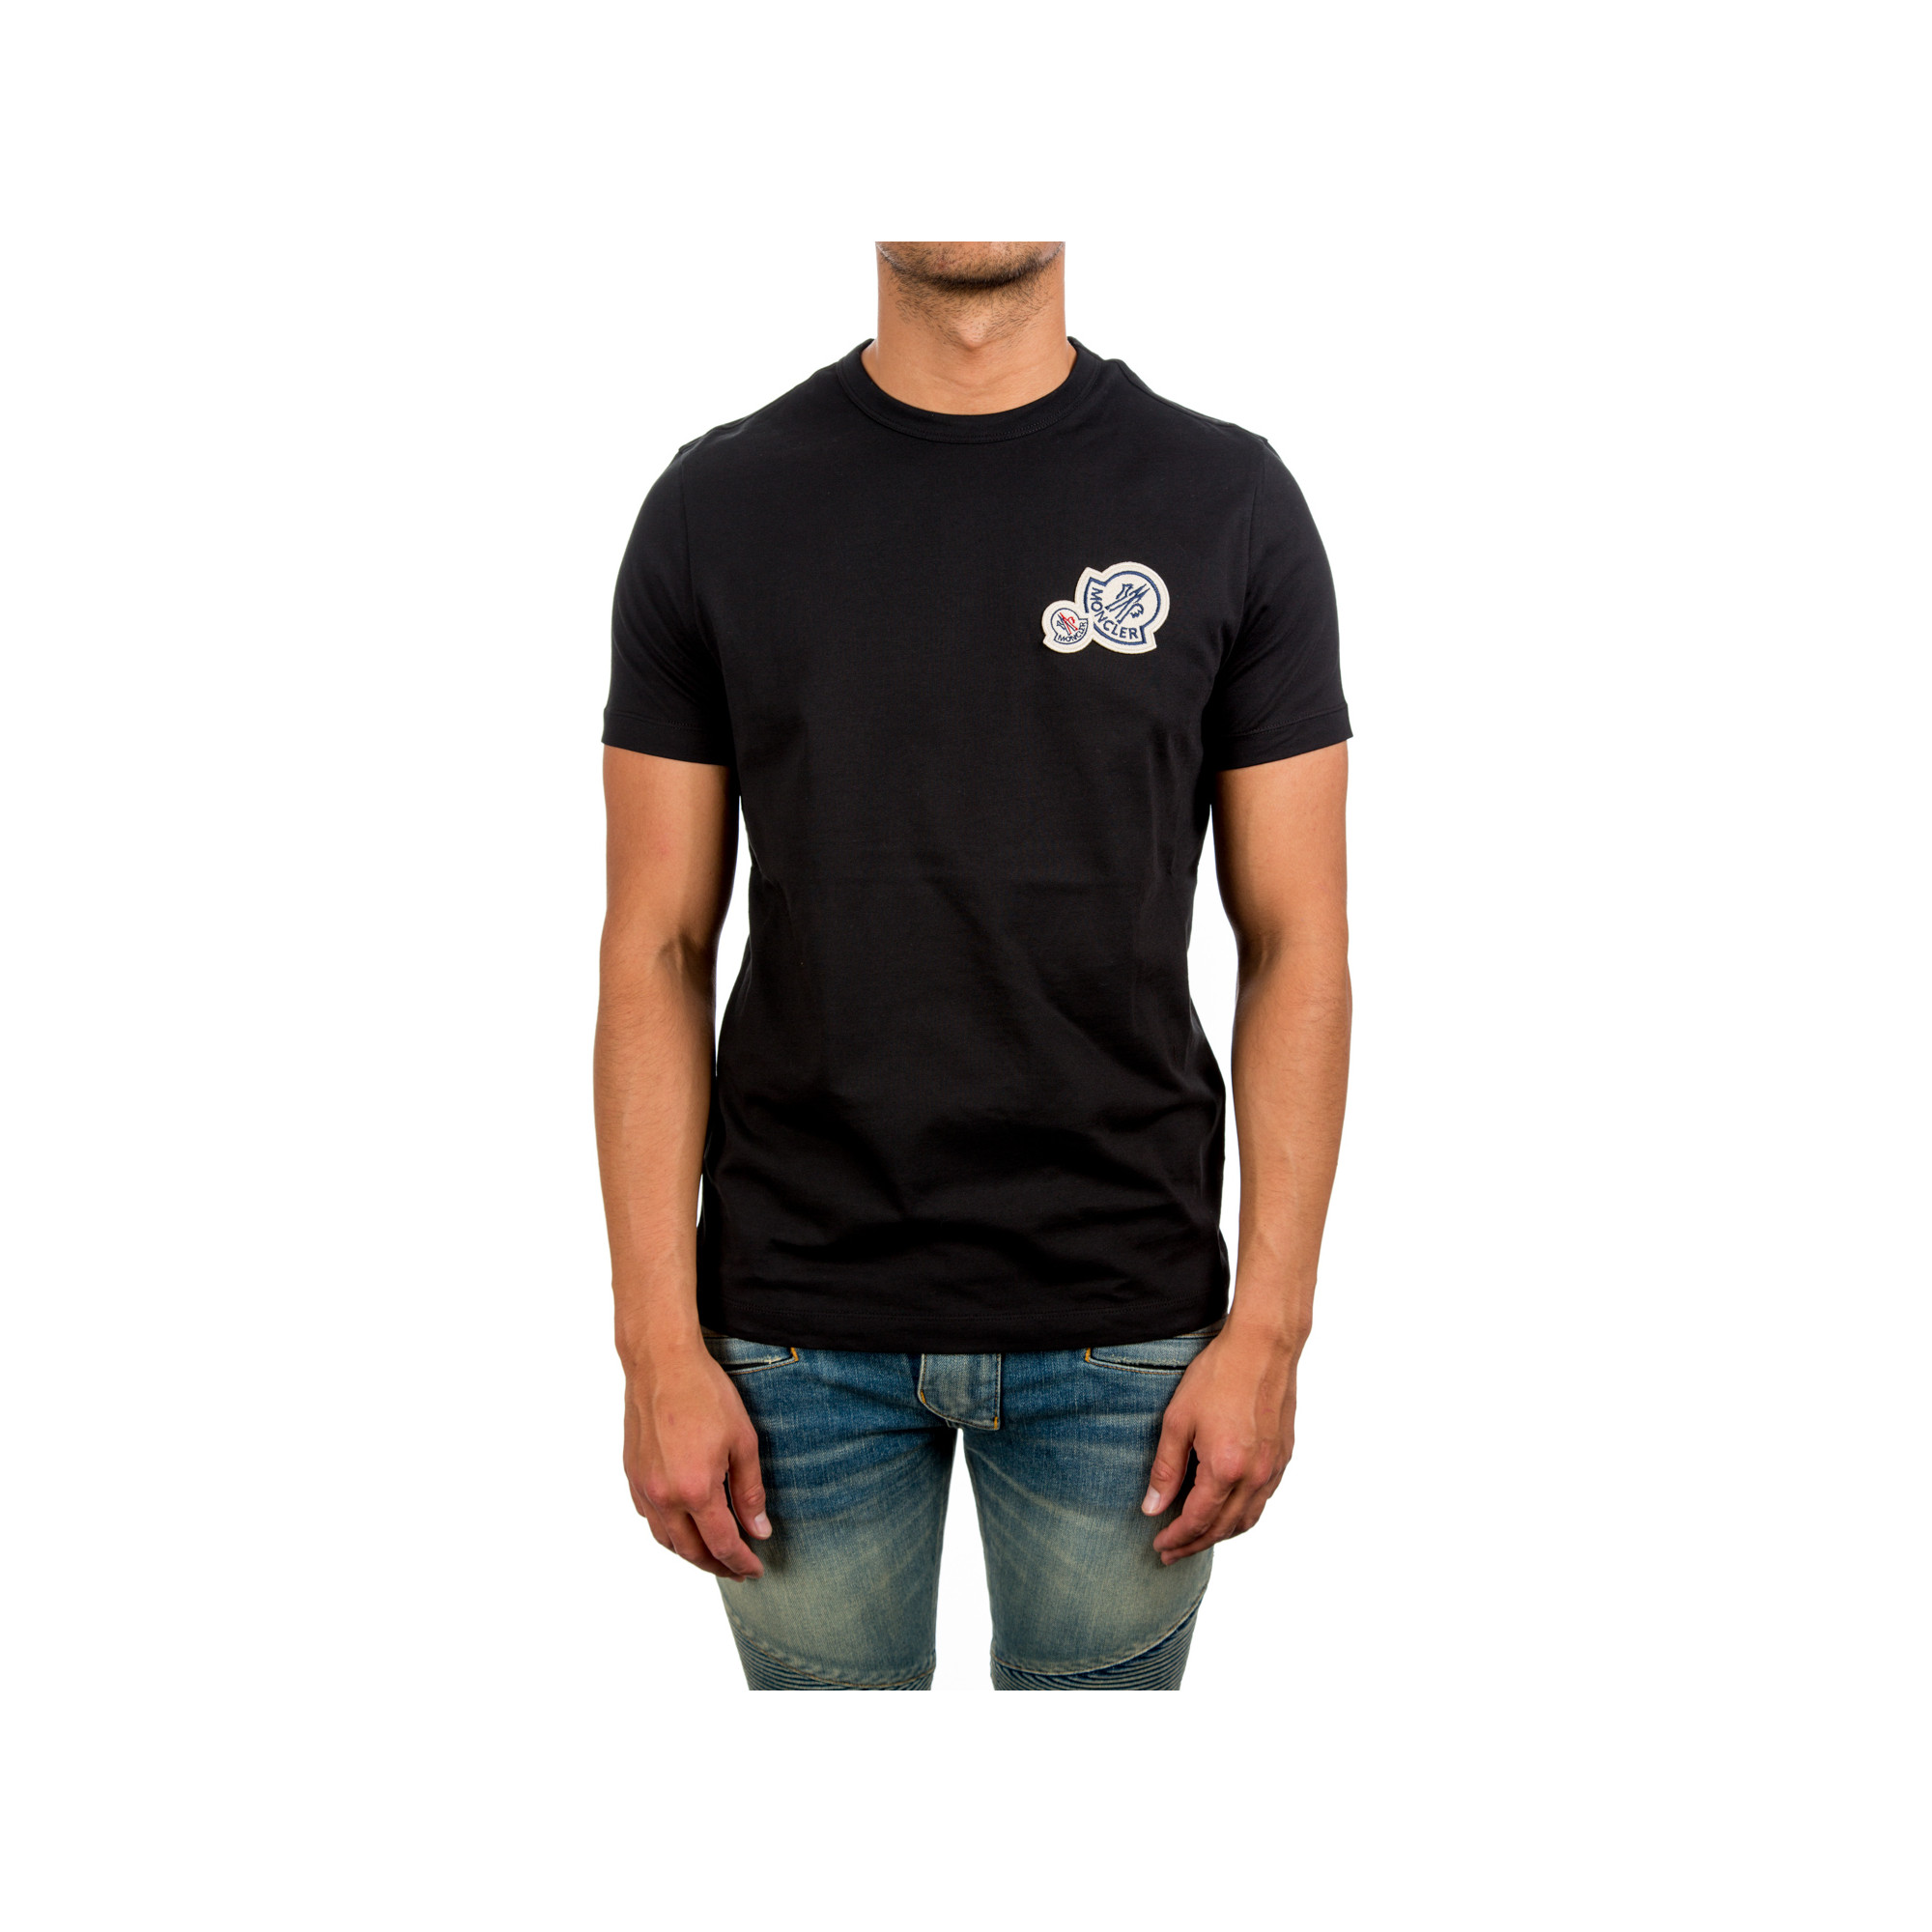 5a74738c2 Moncler Maglia T Shirt esw-ecommerce.co.uk